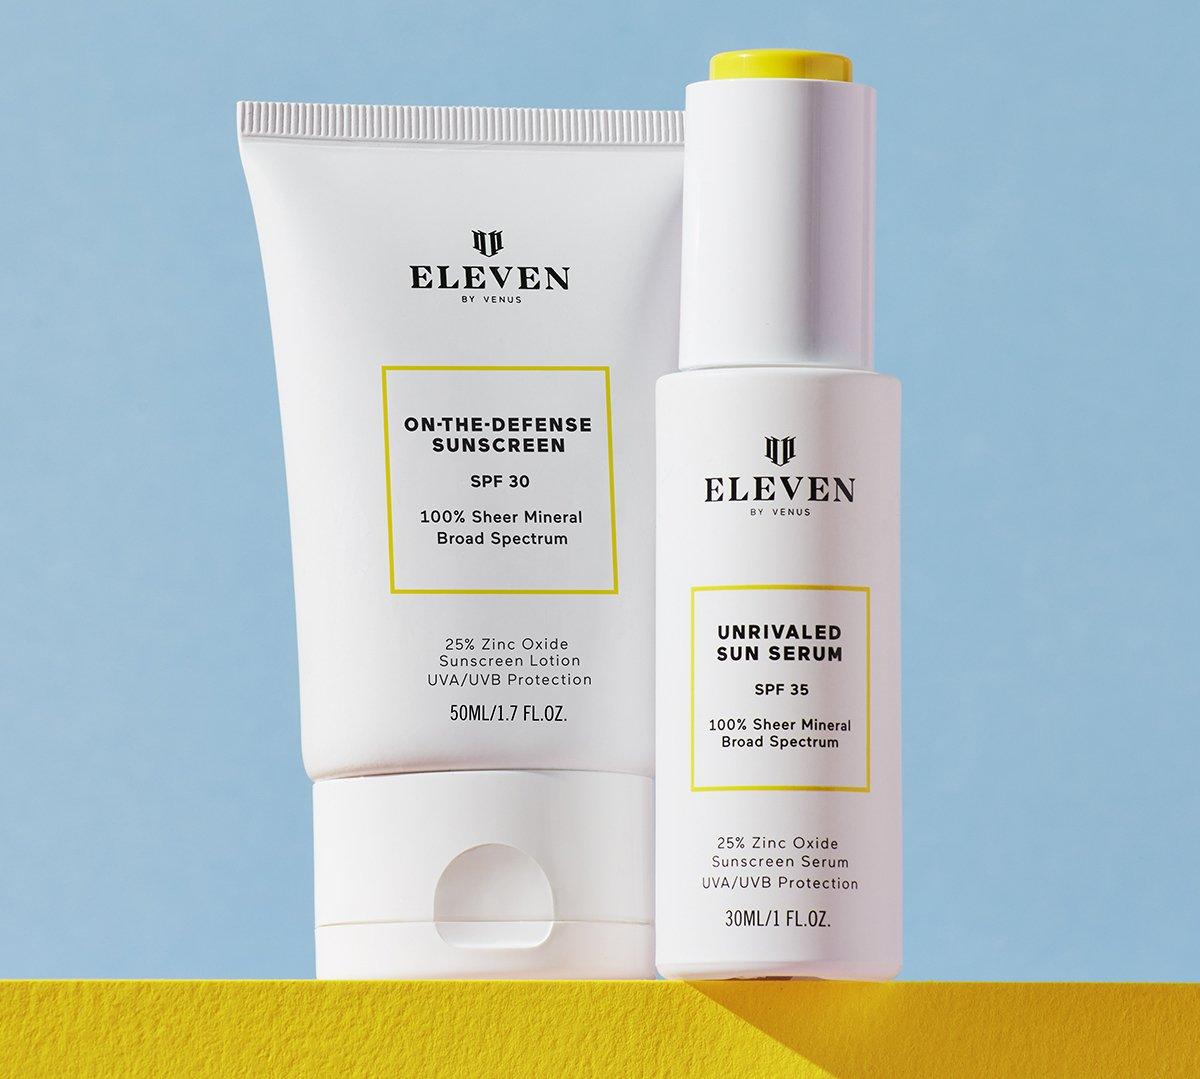 EleVen sunscreens